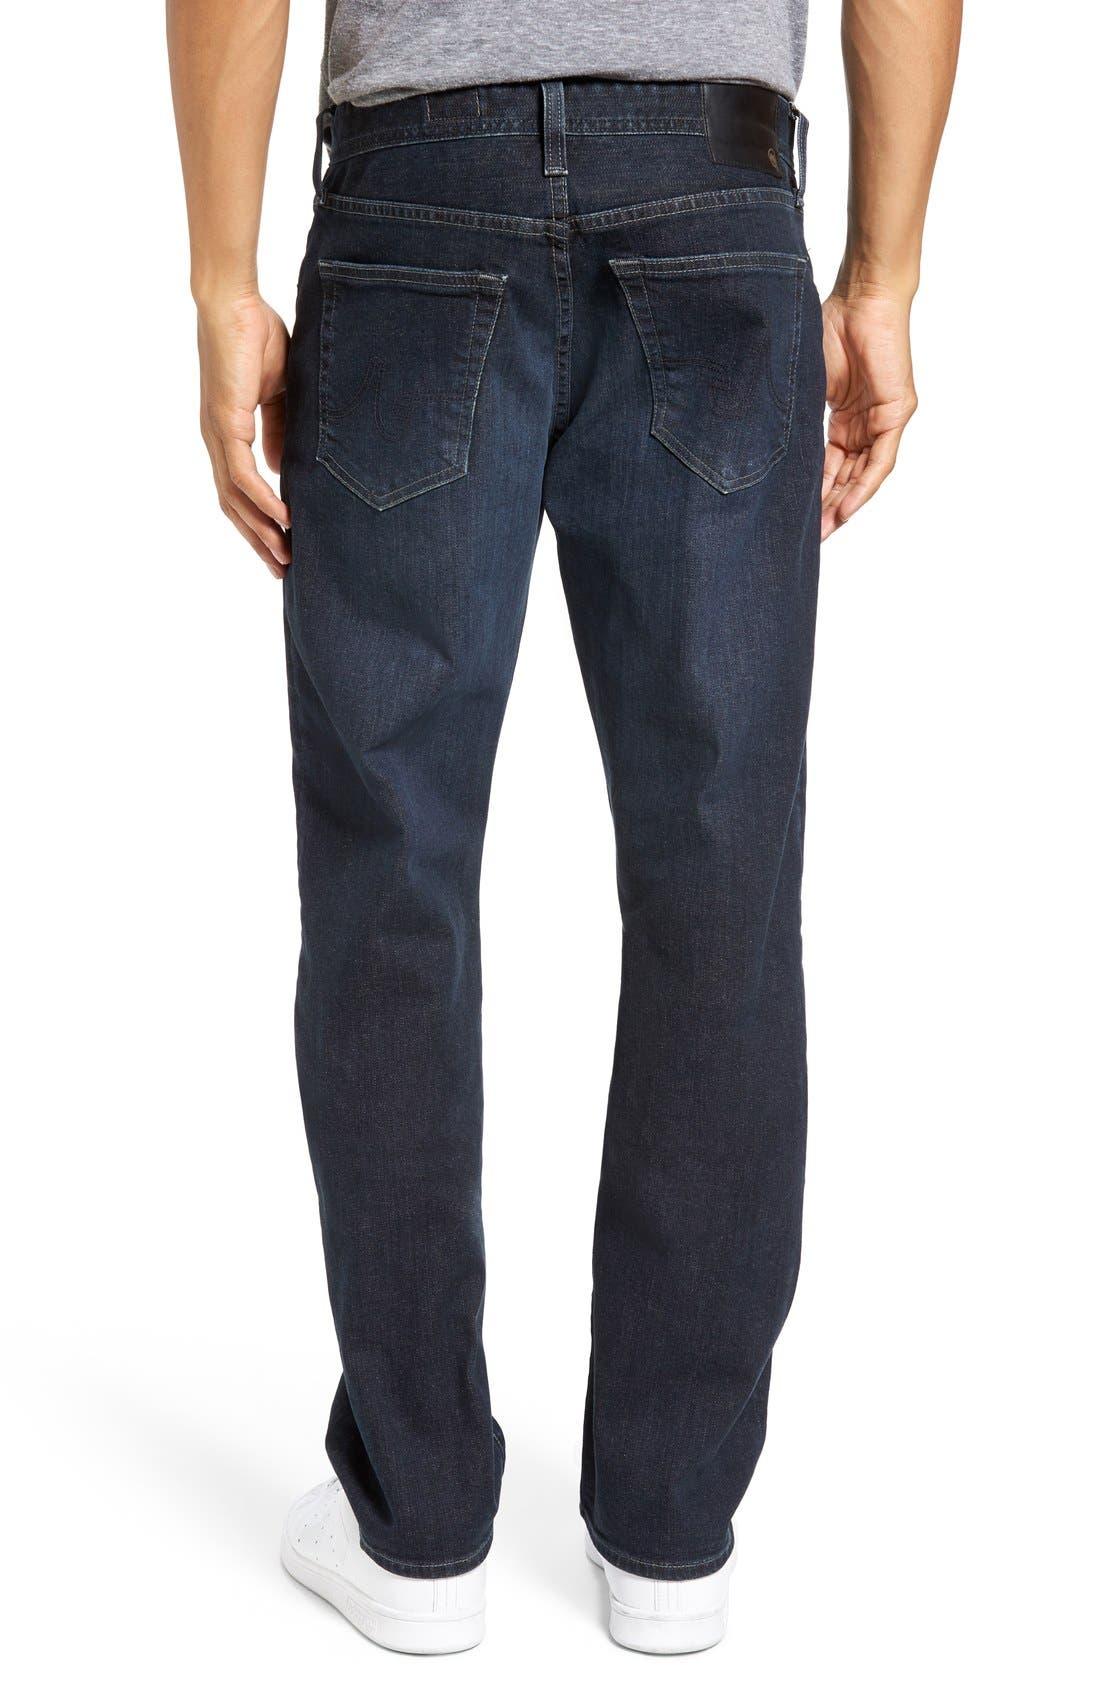 Graduate Slim Straight Leg Jeans,                             Alternate thumbnail 2, color,                             Rockwell